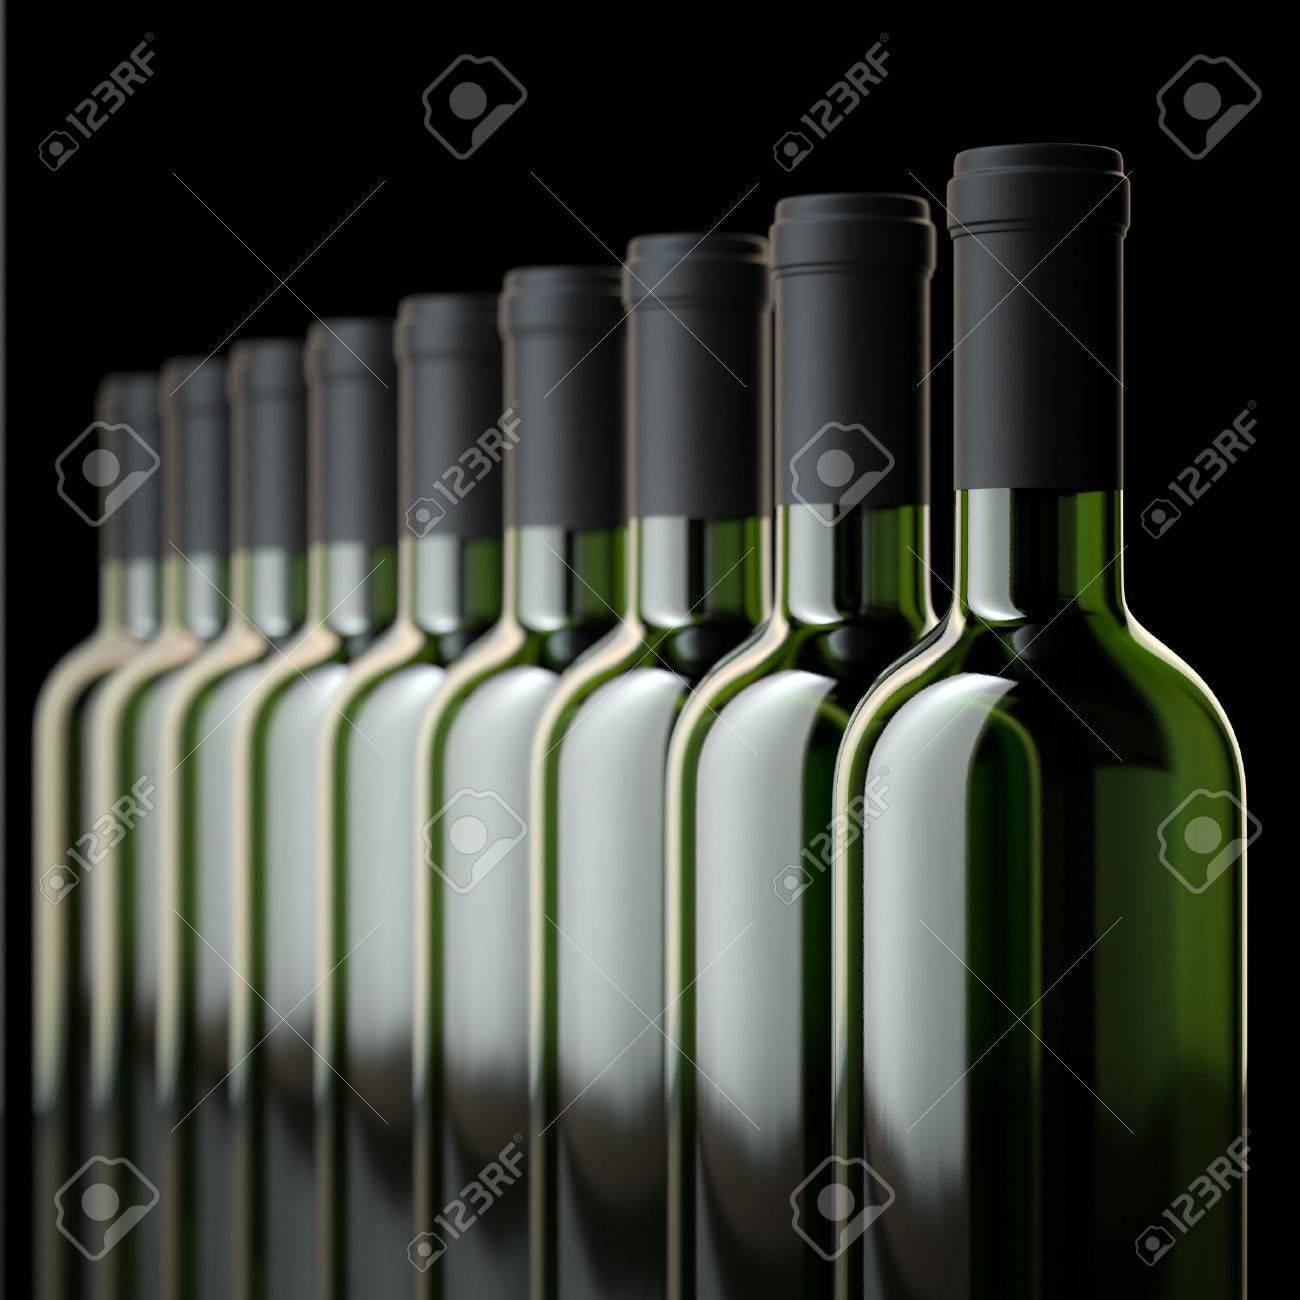 Red Wine Bottles In Wine Cellar Or In Liquor Store - 25202969